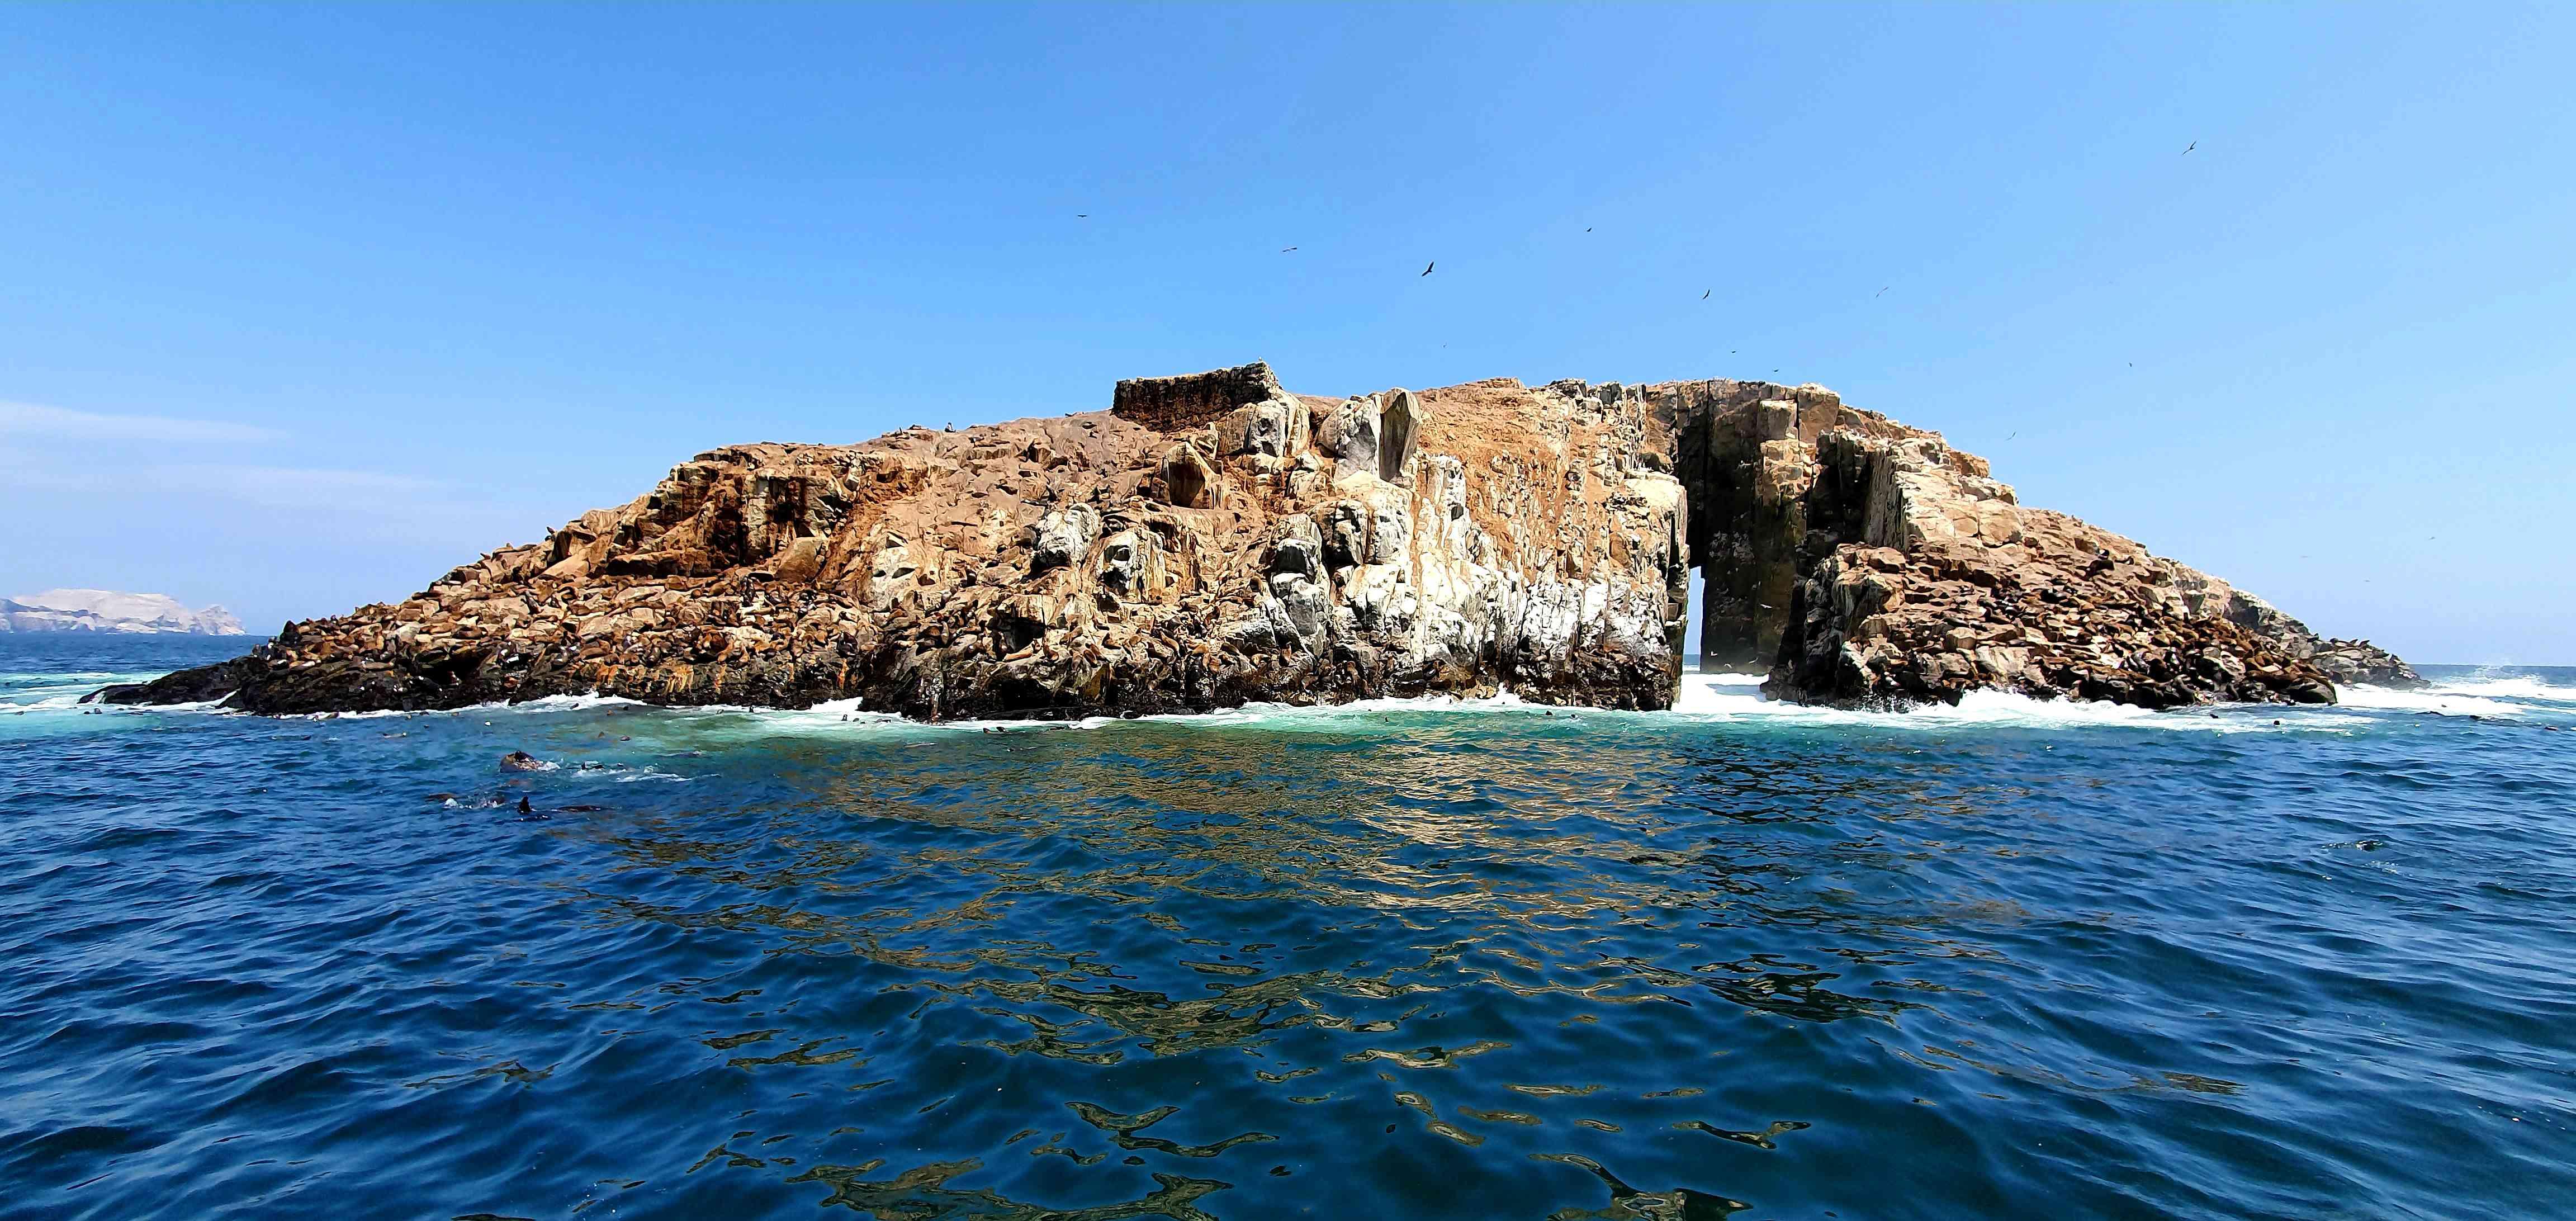 Amazing Peru. Sea Lions in Palomino Islands